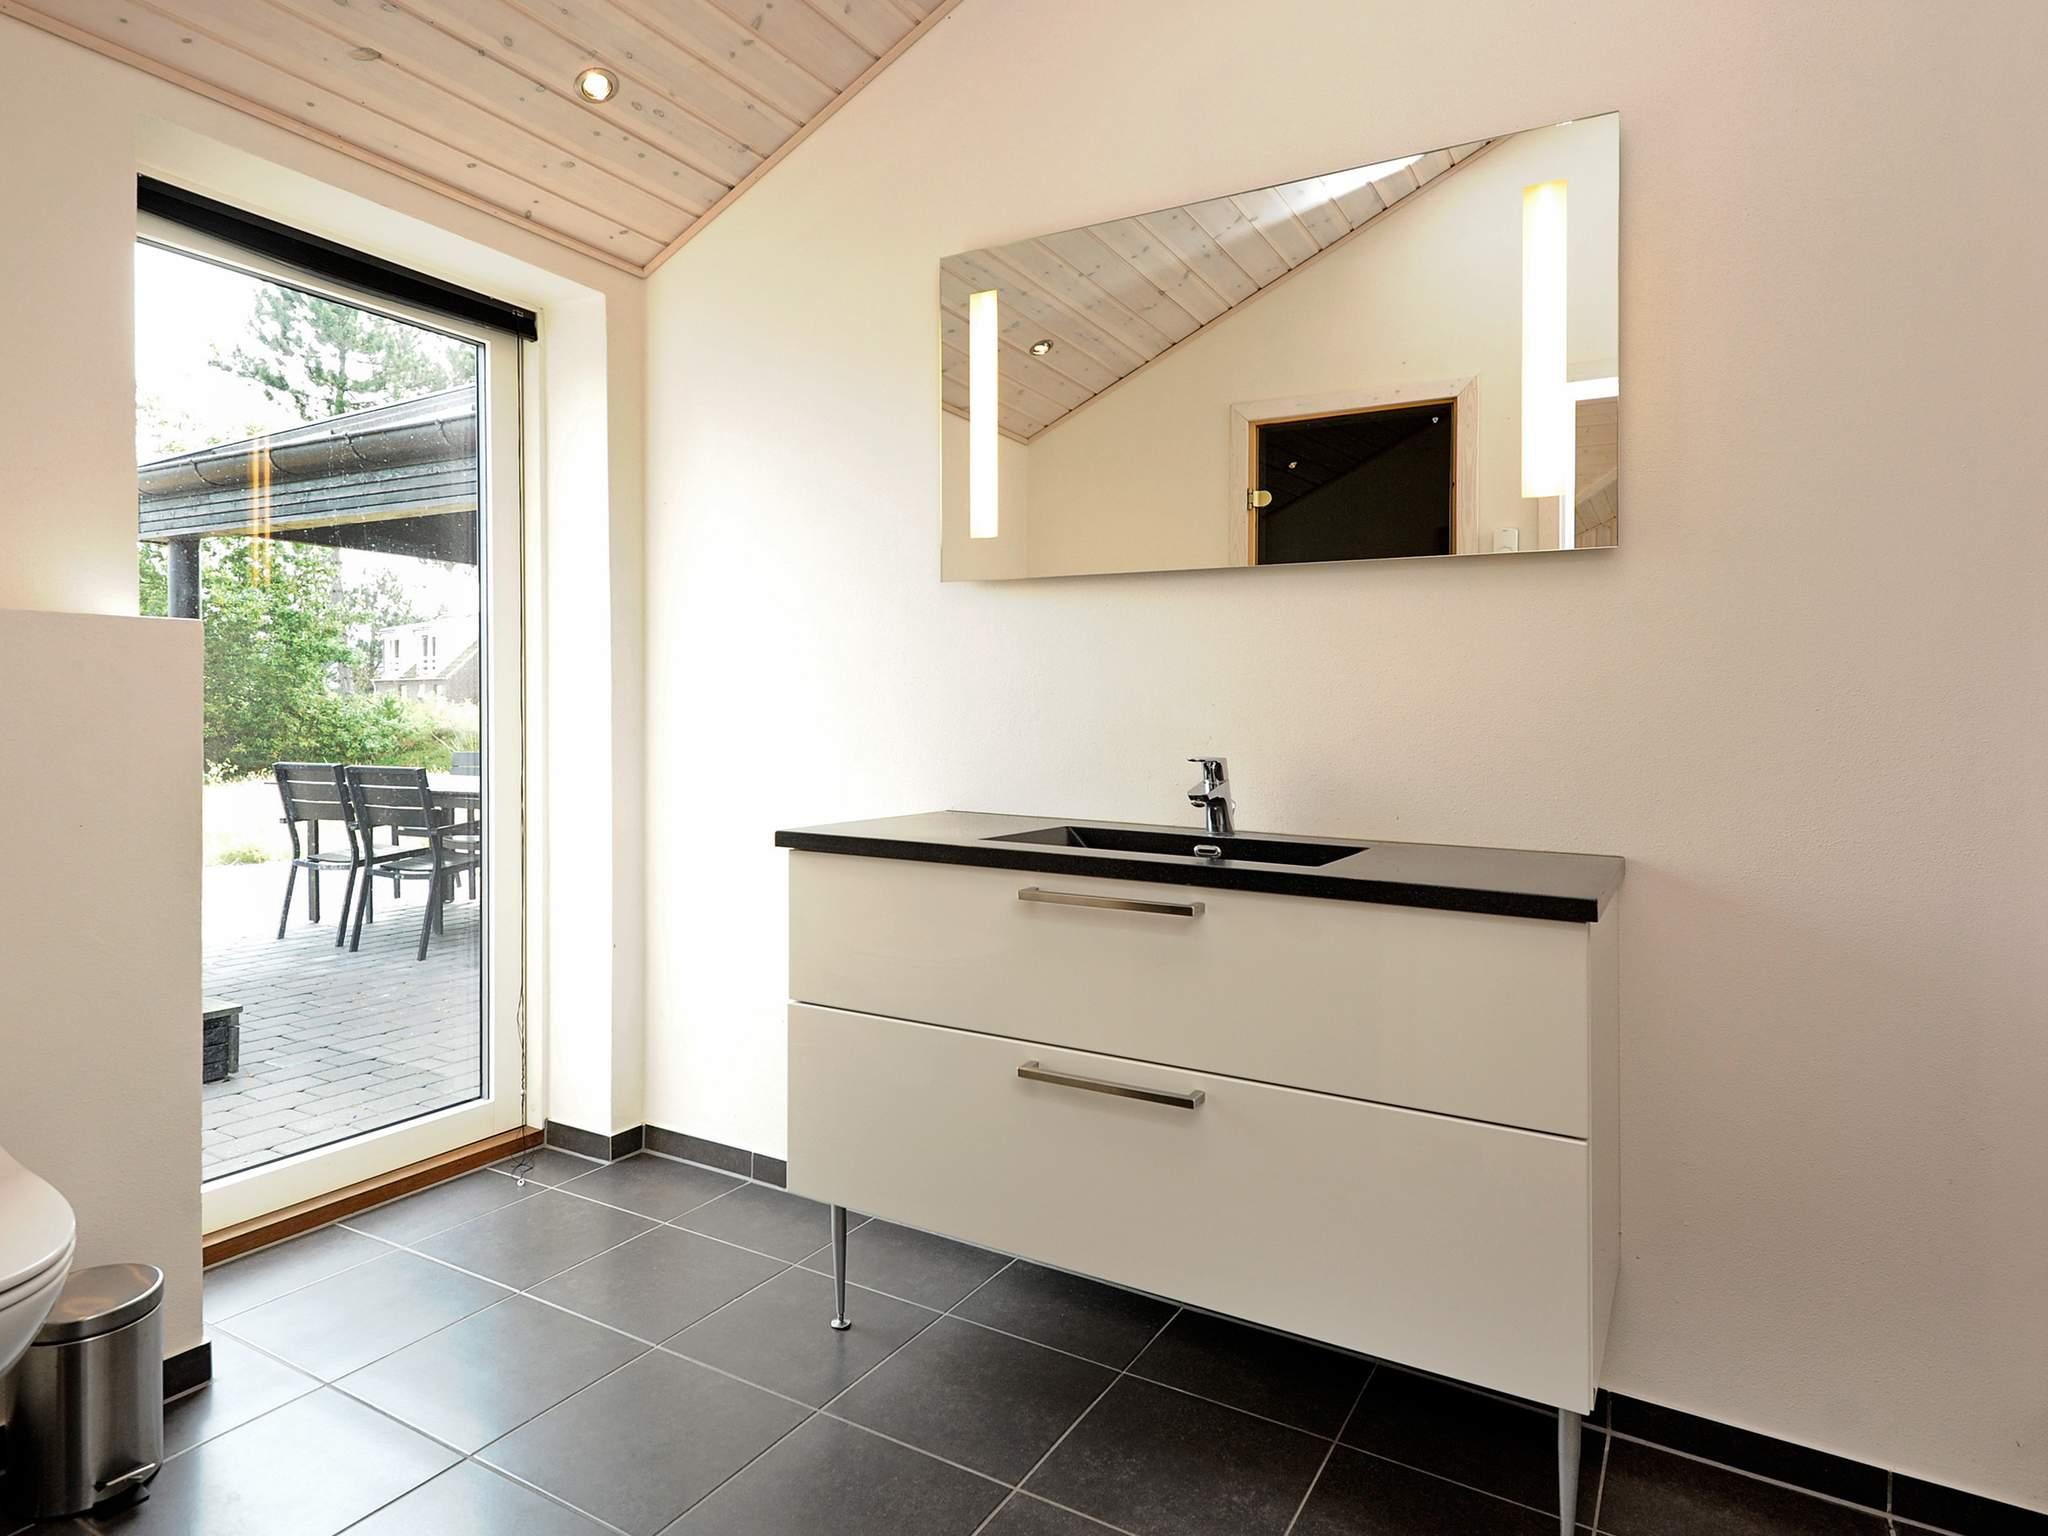 Ferienhaus Rømø/Havneby (437893), Rømø, , Südwestjütland, Dänemark, Bild 31